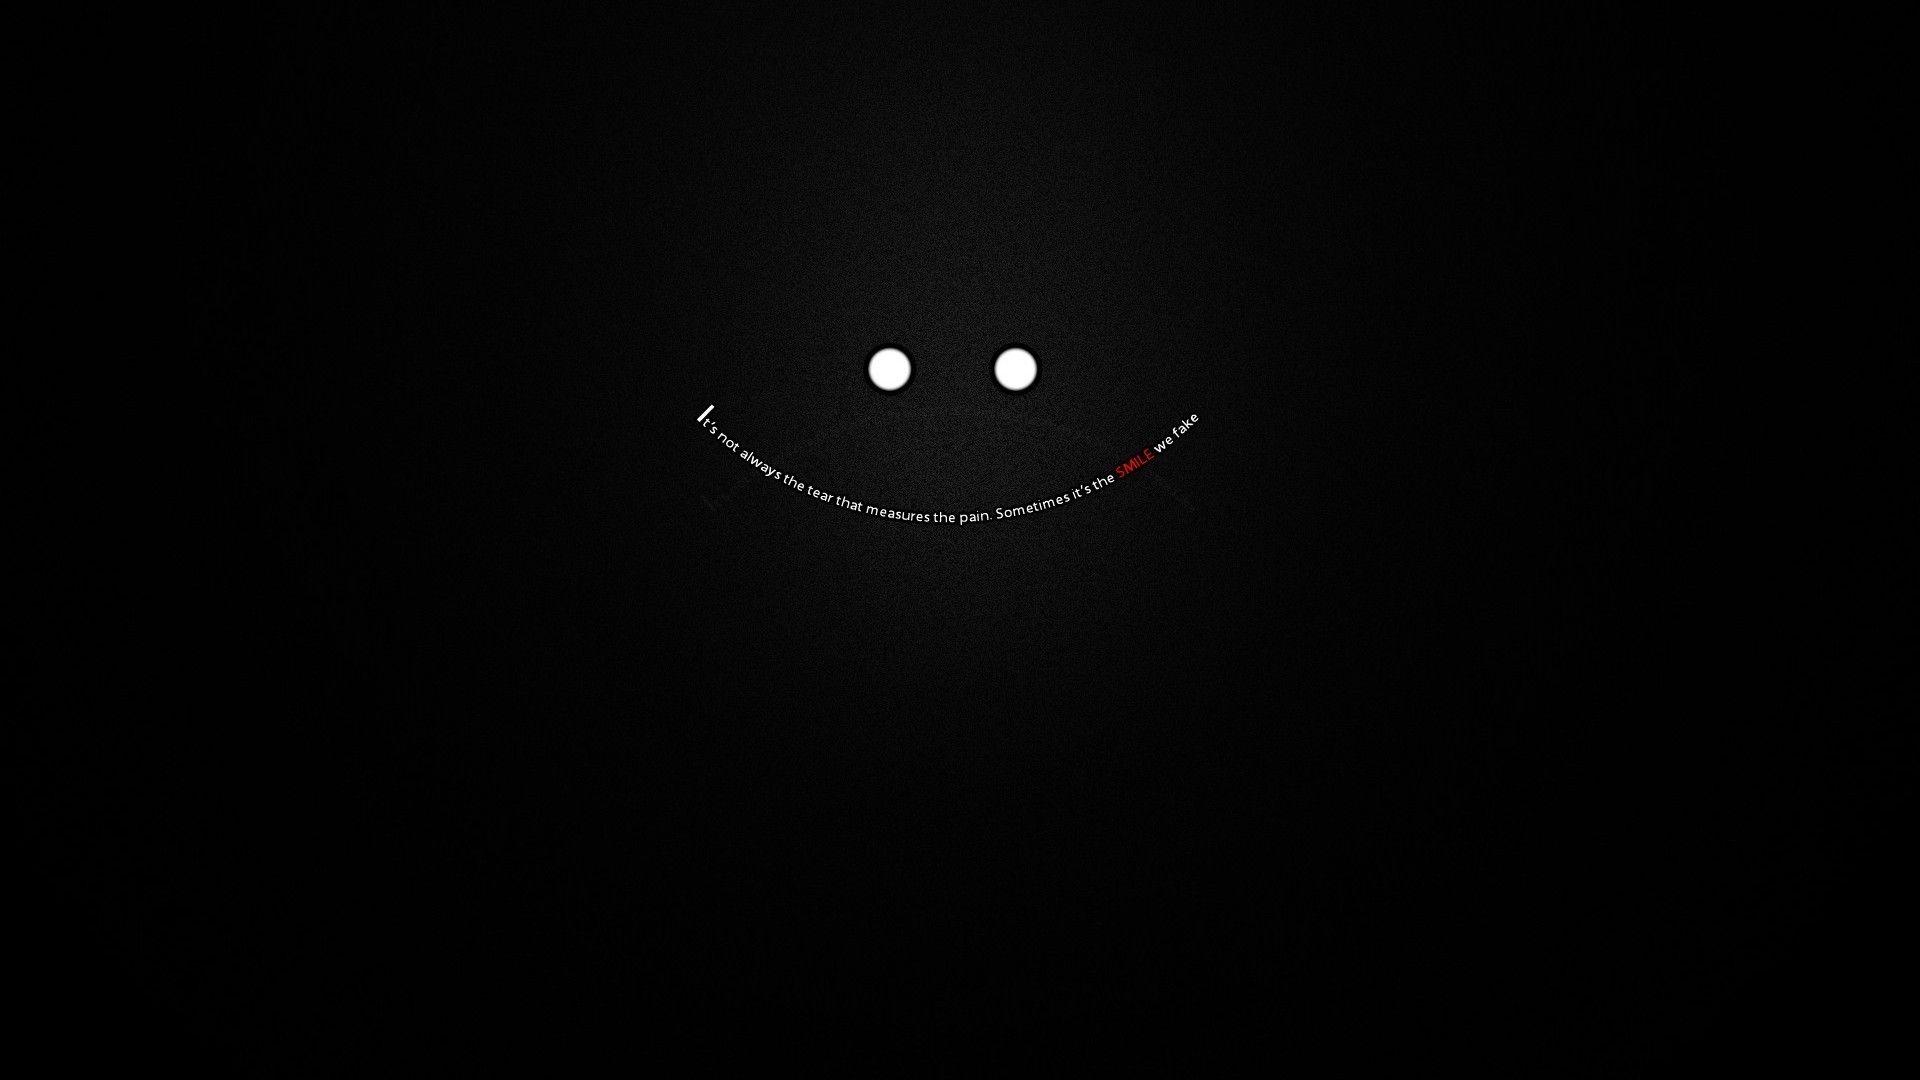 The smile could be painful Wallpaper gelap Wallpaper sedih 1920x1080